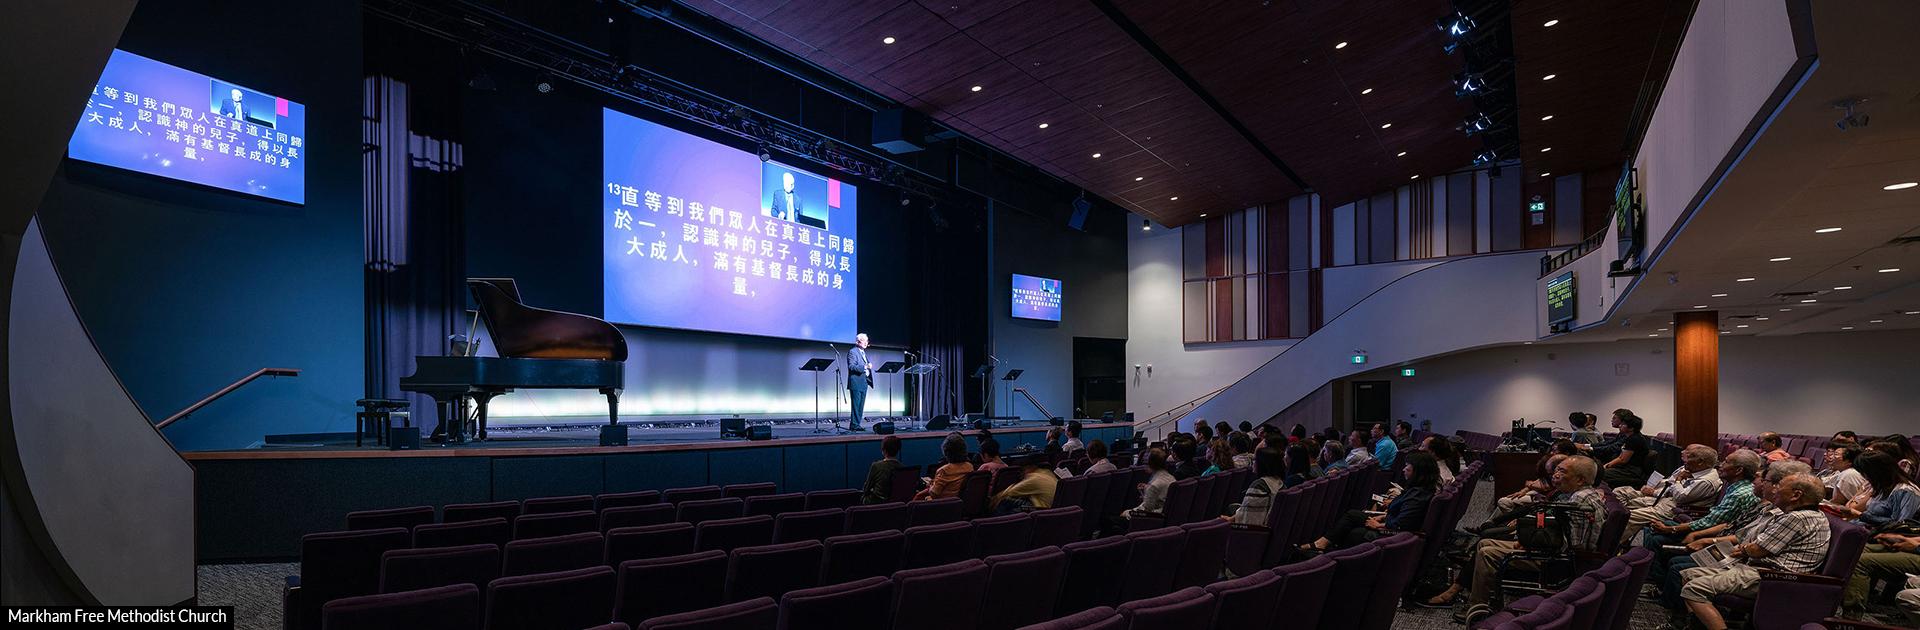 Markham Free Methodist Church